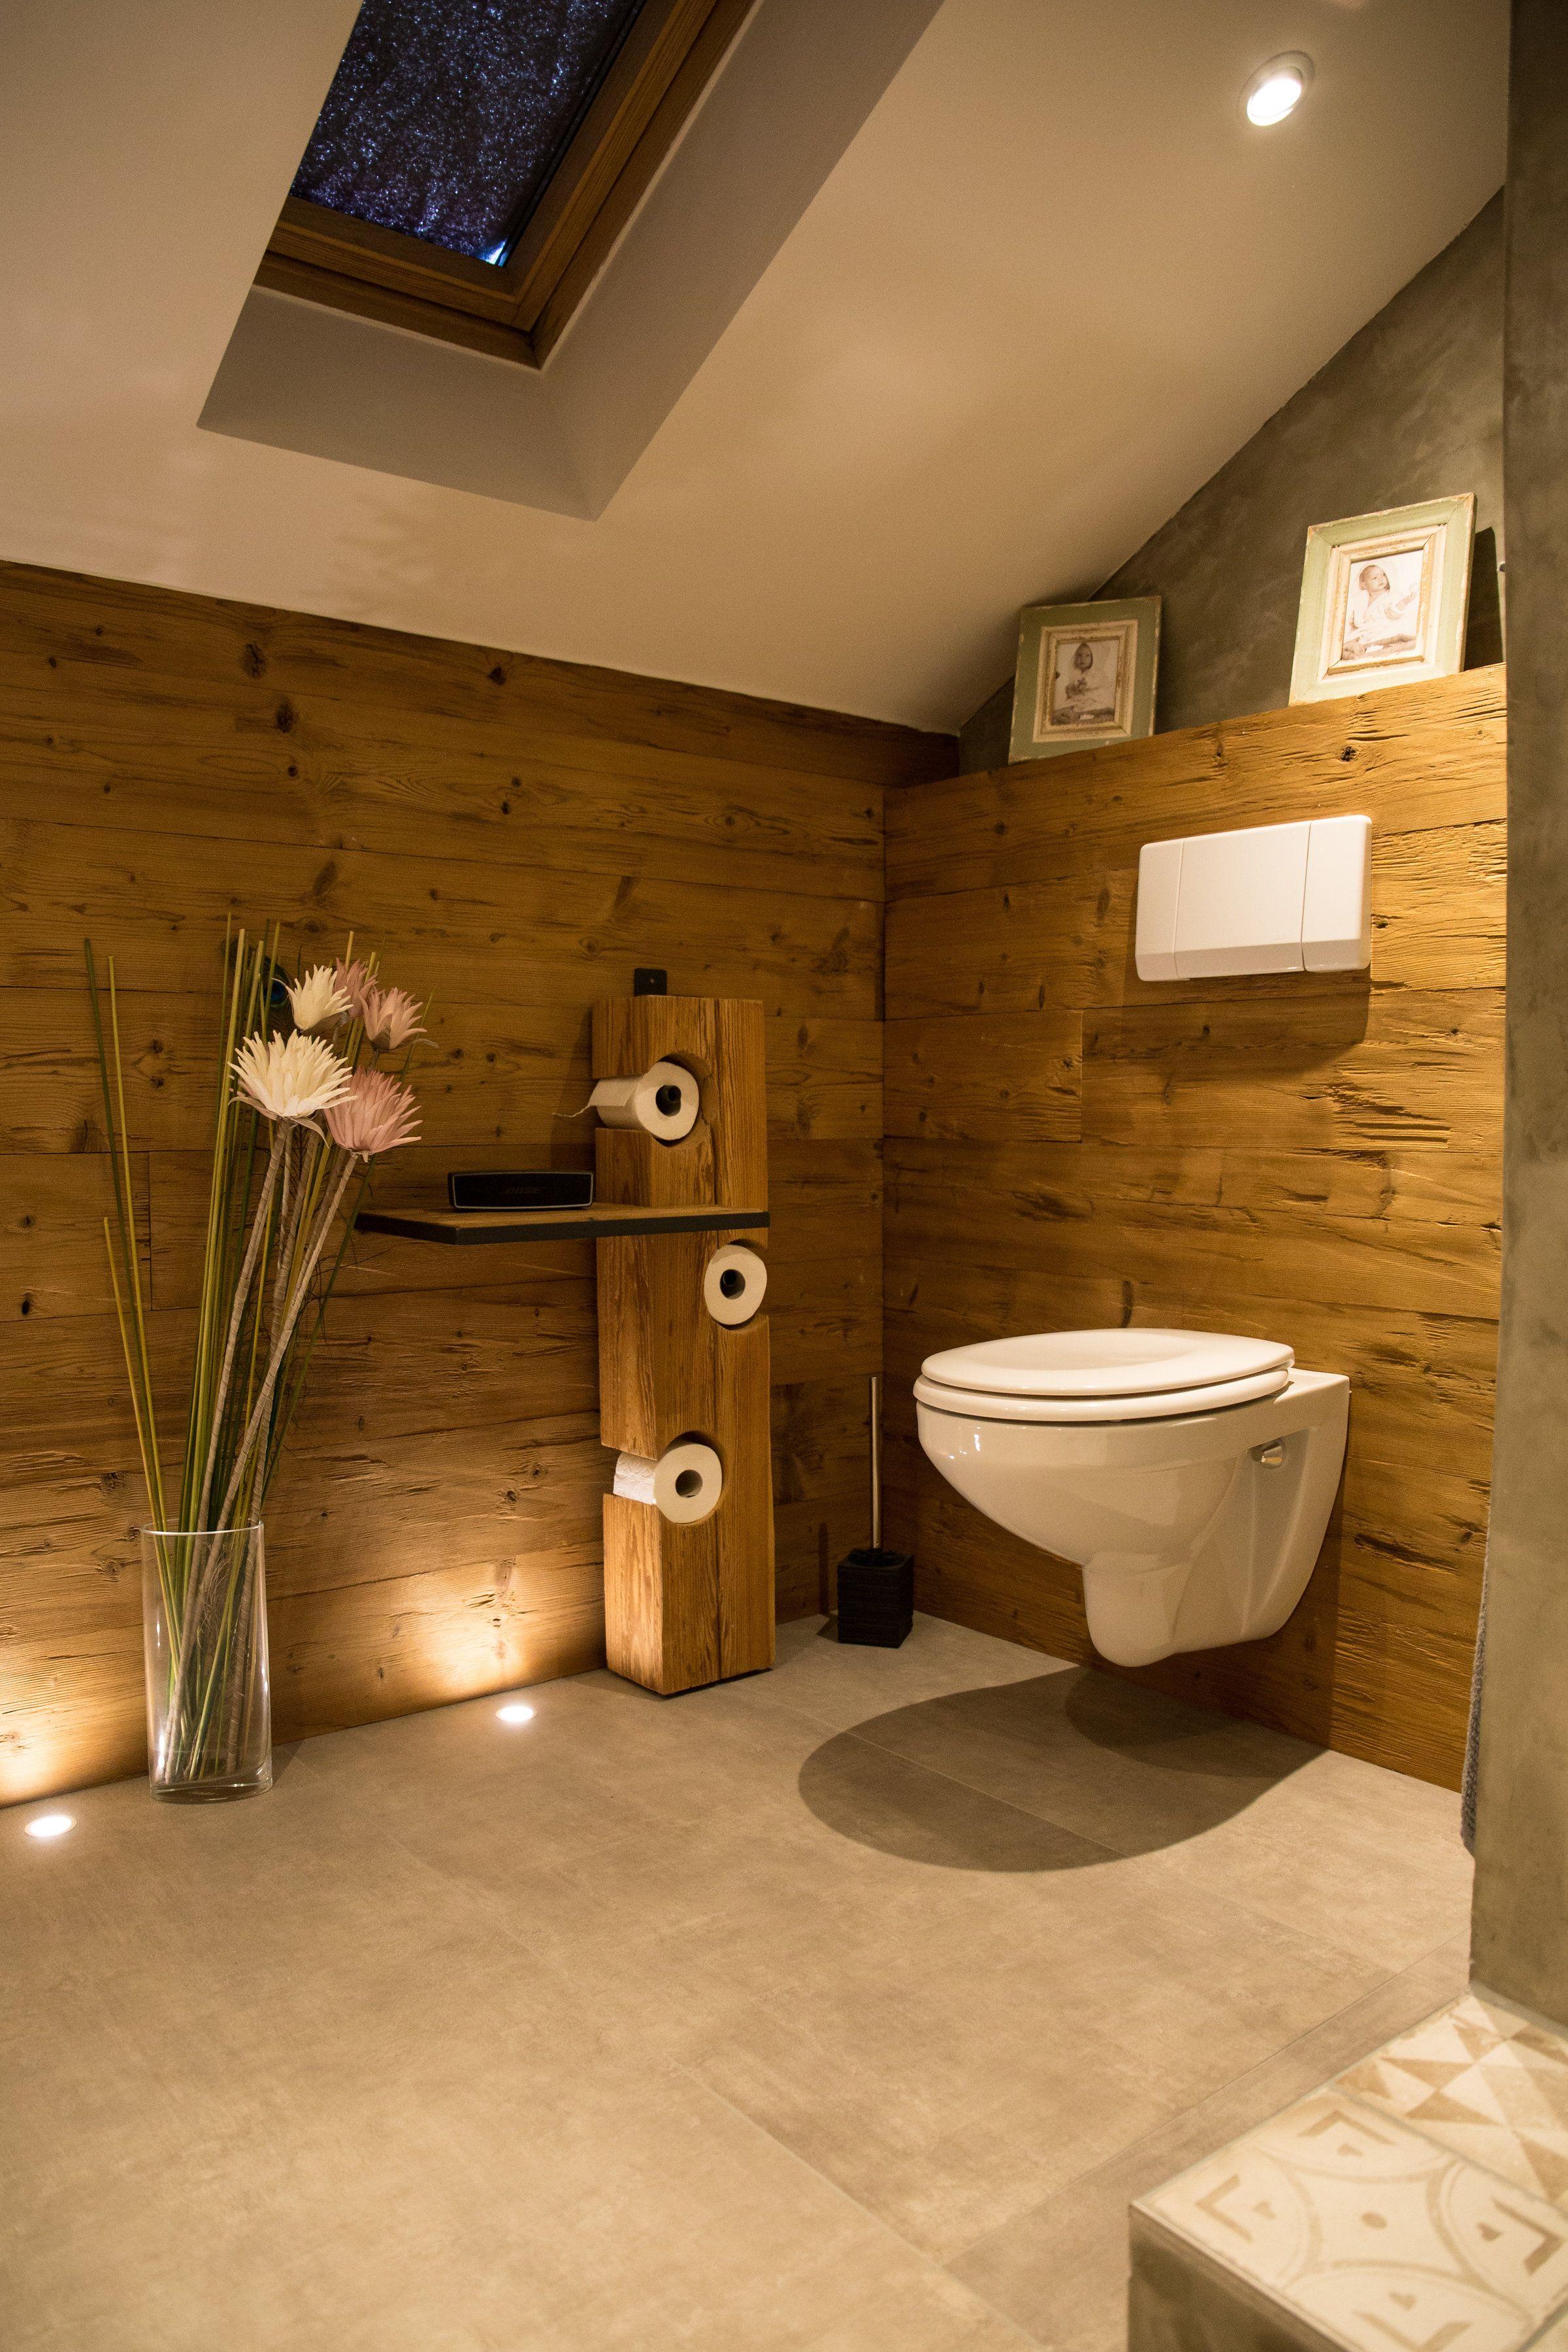 Bad Mit Altholz Badezimmer Holz Wohnung Badezimmer Dekoration Wohnung Badezimmer